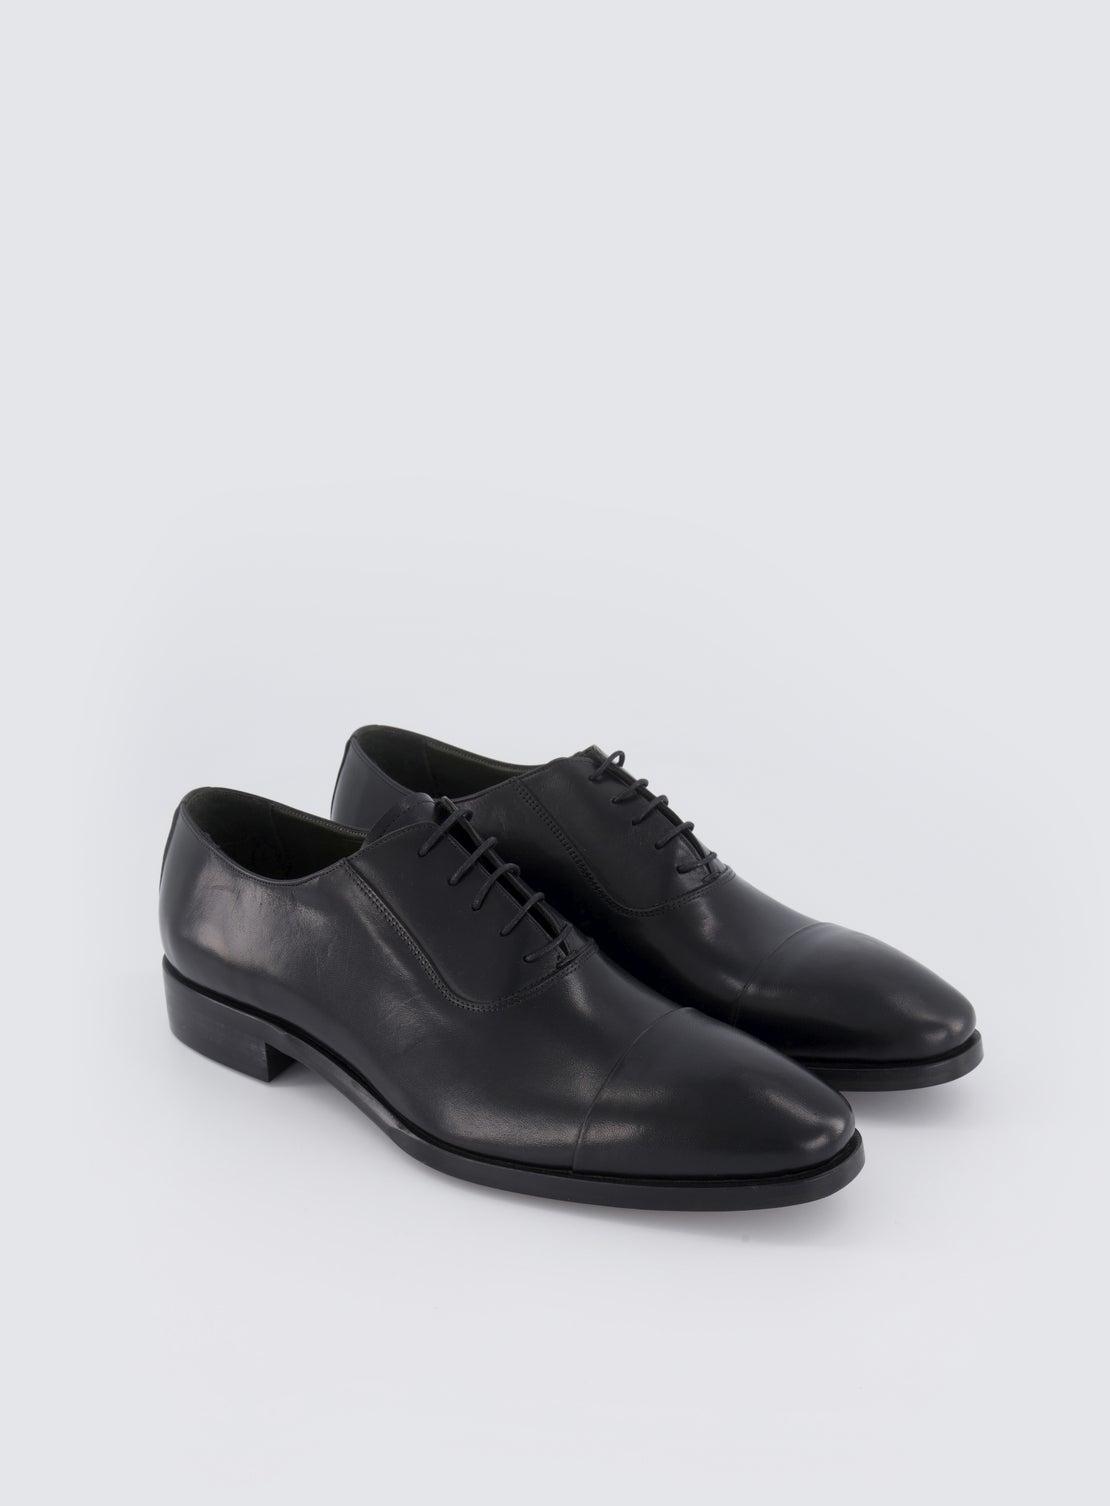 Adams Black Toe Cap Shoe